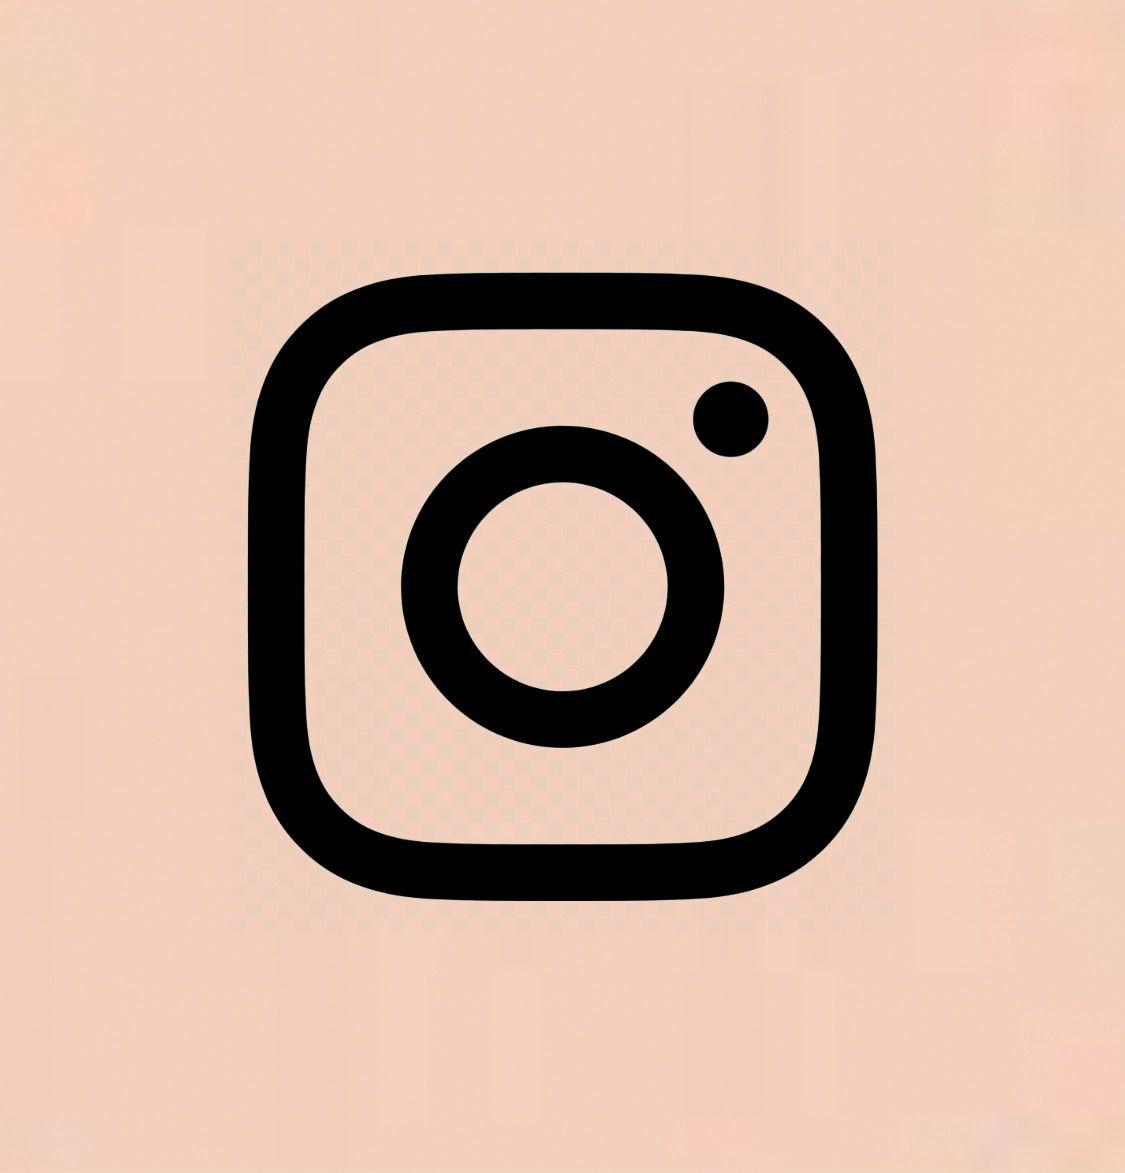 Ios 14 Instagram Logo Pastel Instagram Logo App Icon App Icon Design